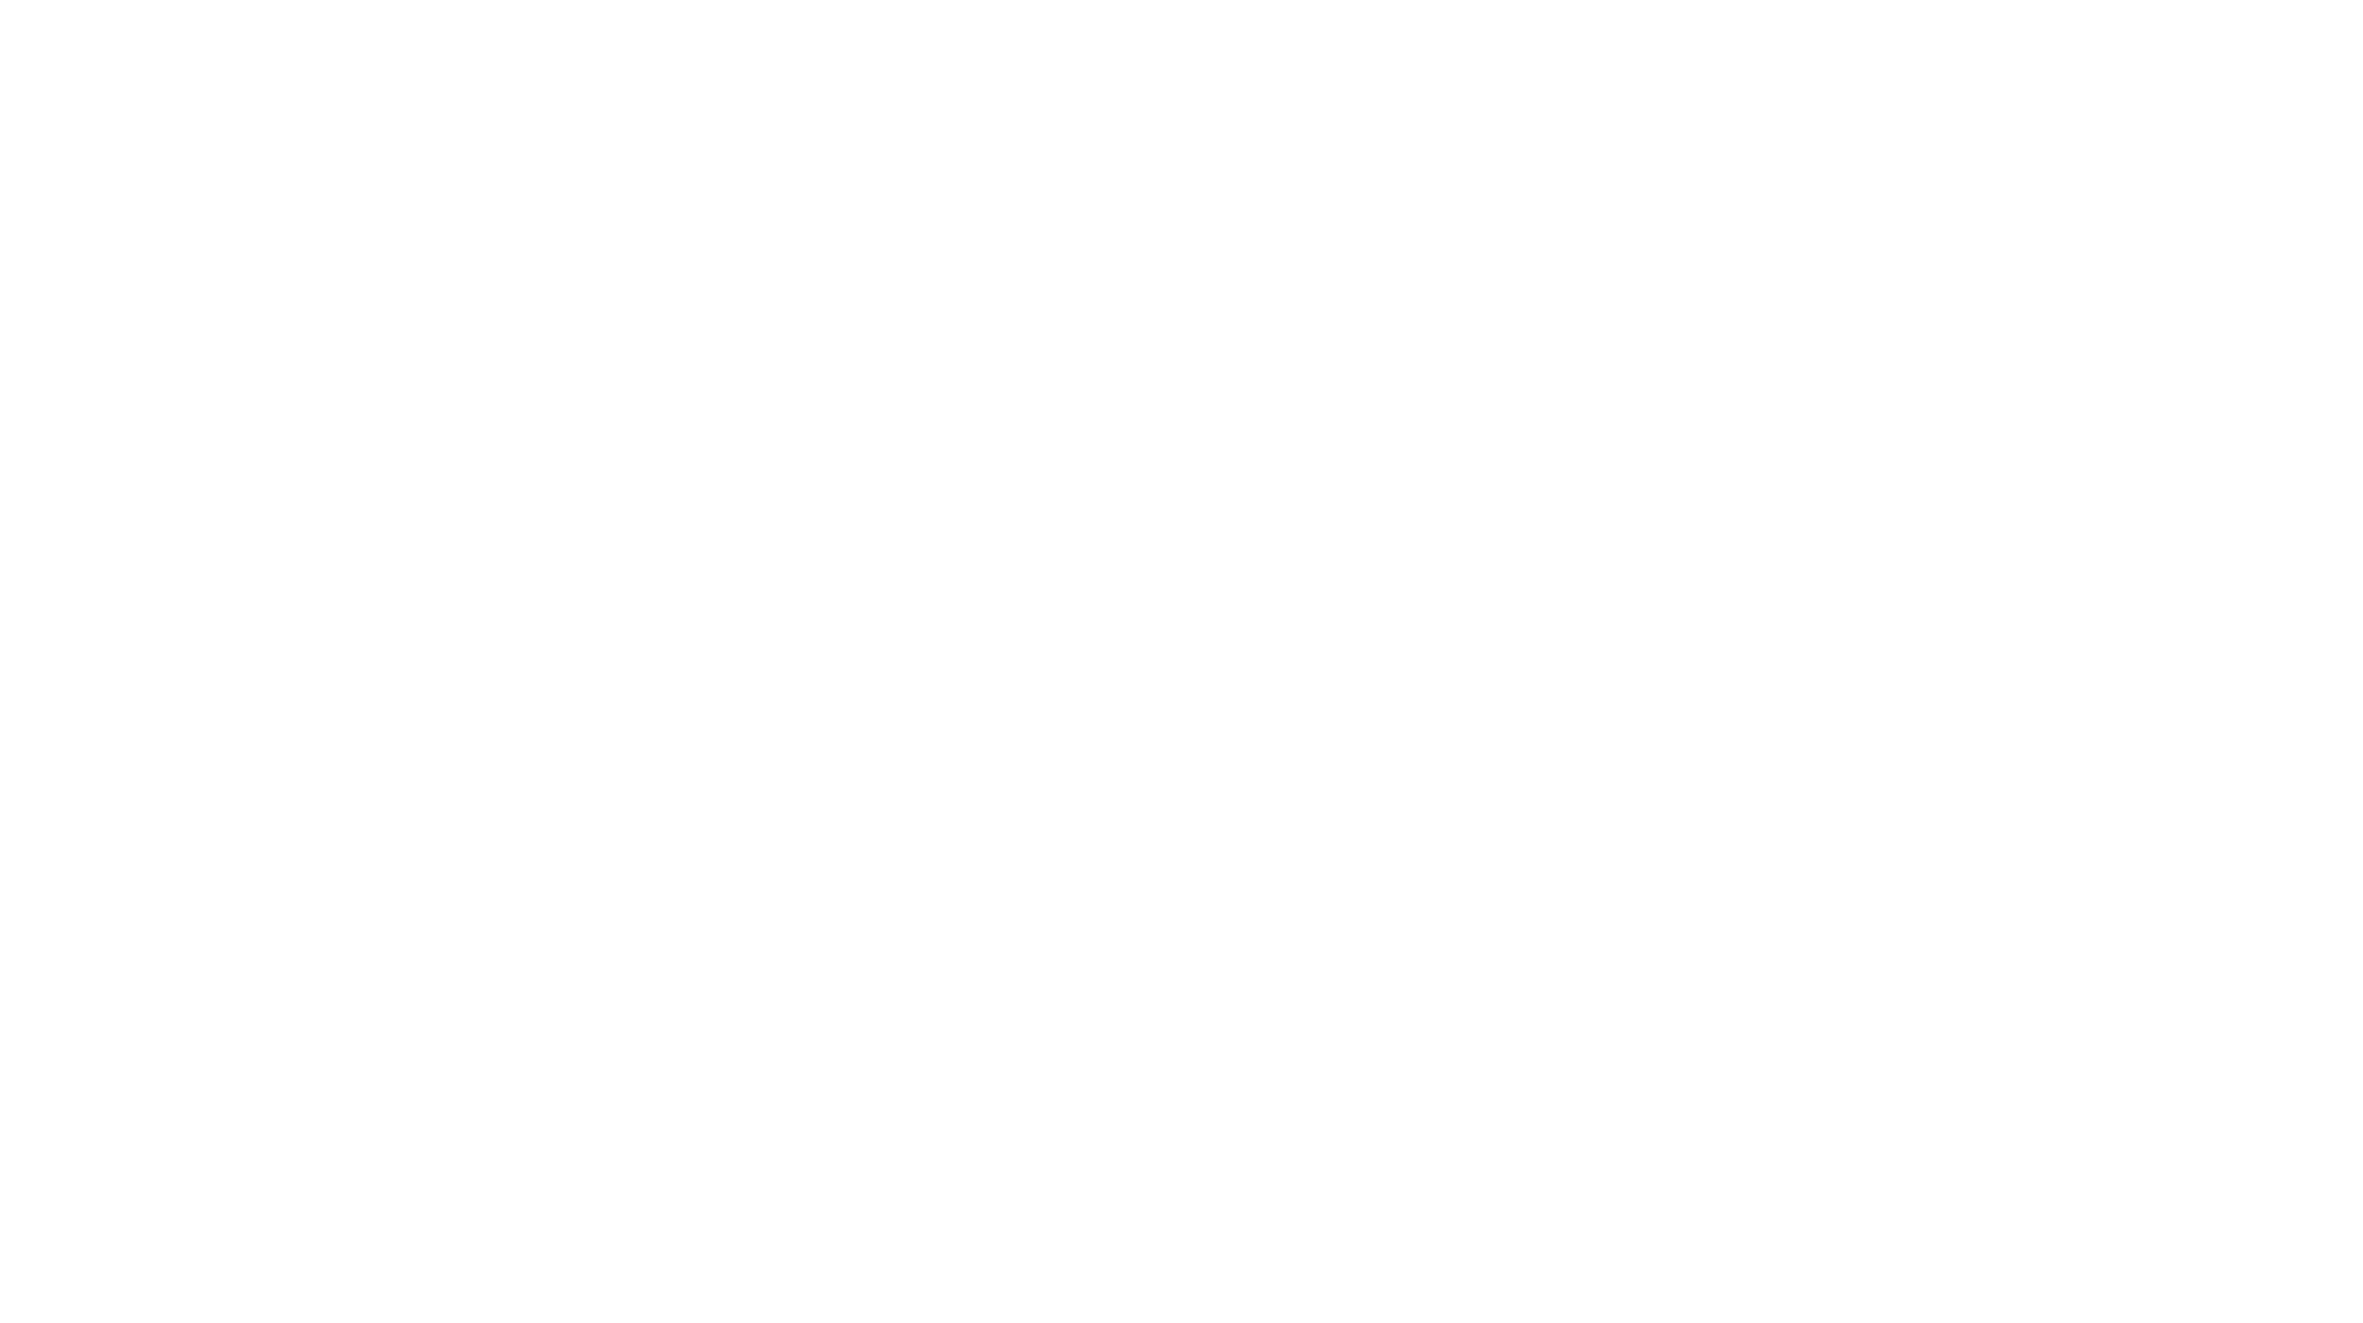 Fournel Advisory